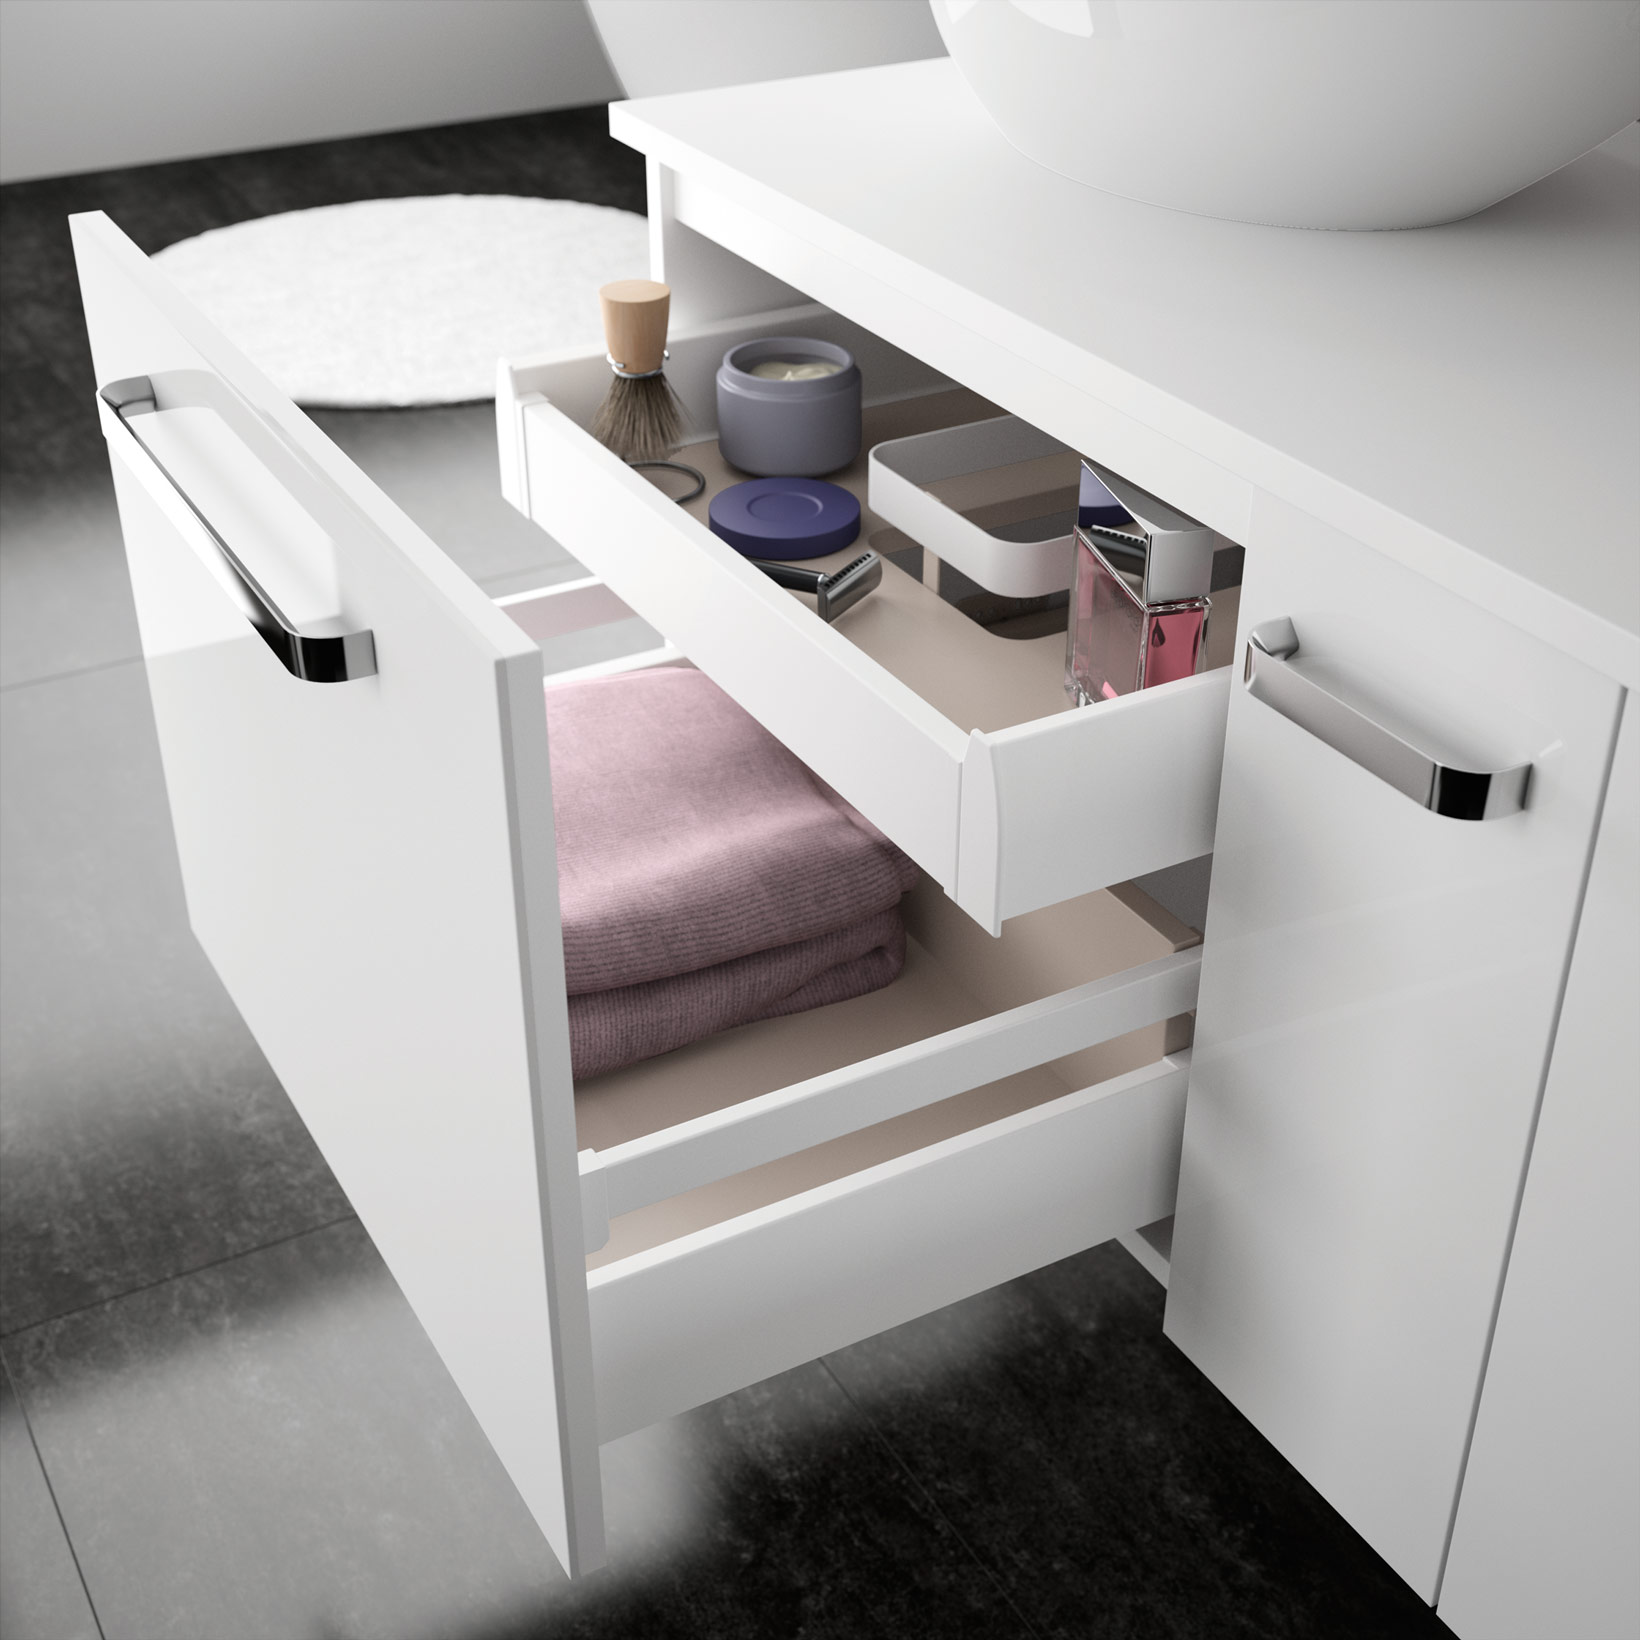 Zoé   Meubles de salle de bains, baignoires, fabricant français CEDAM